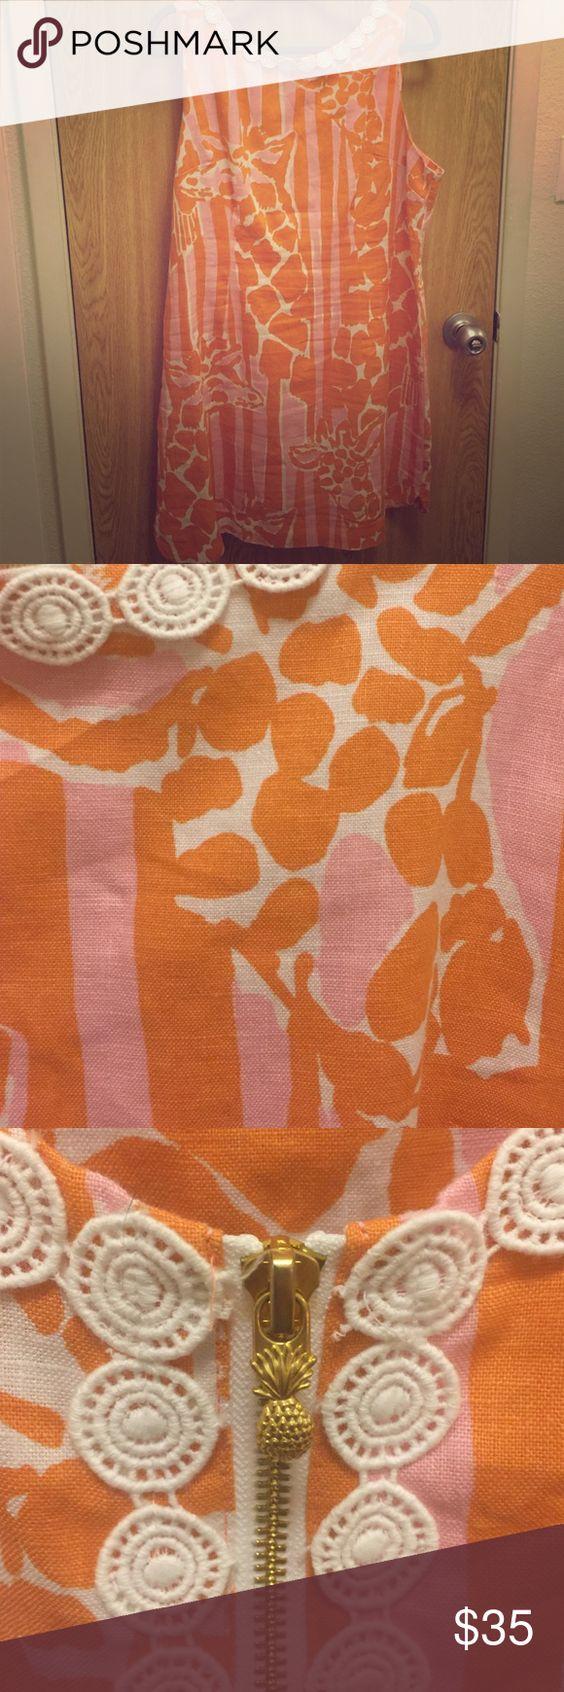 Lilly Pulitzer giraffe dress Orange and pink giraffe print Lilly Pulitzer Dress! Lilly Pulitzer for Target Dresses